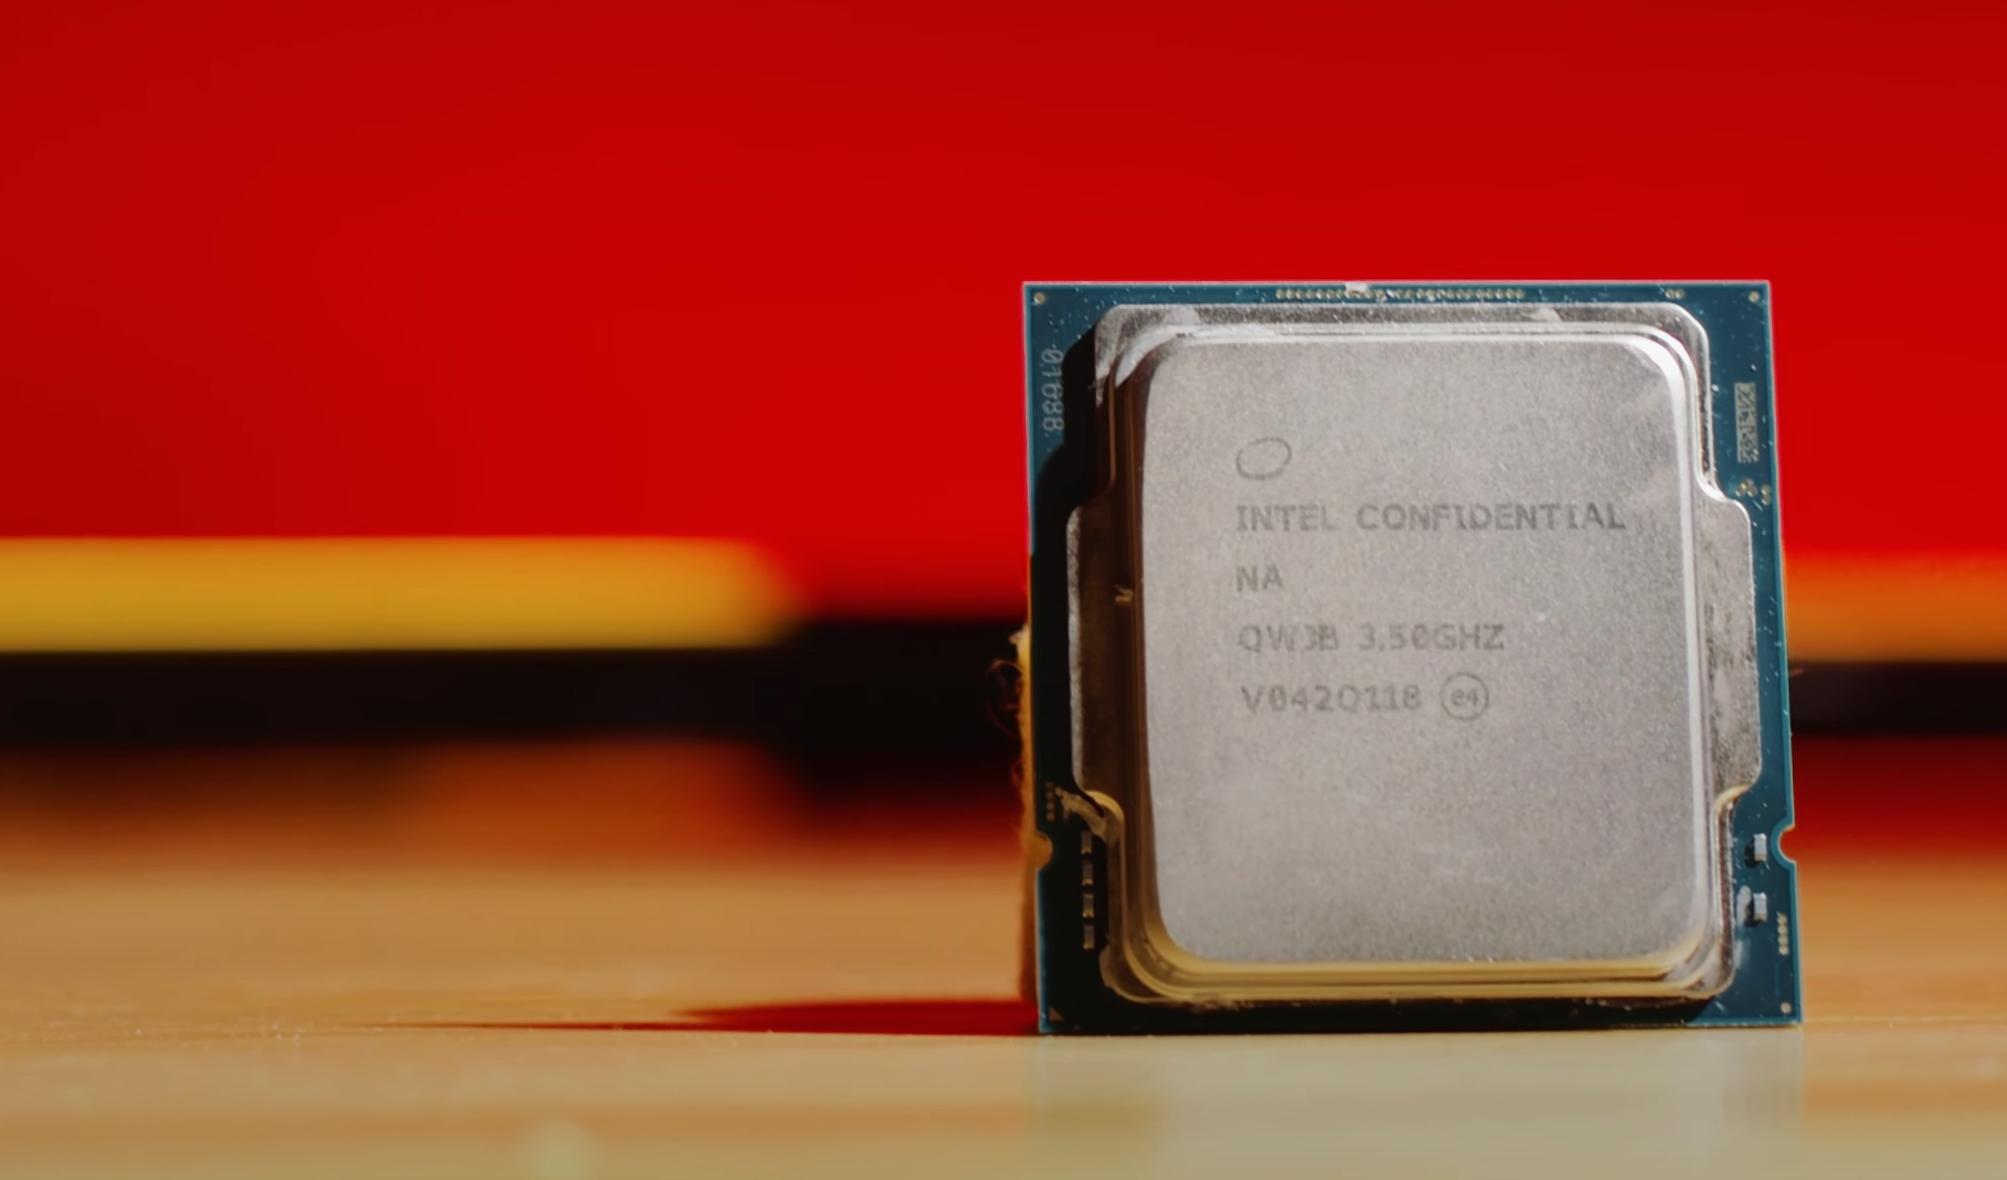 Intel Core i9-11900K Rocket Lake Desktop CPU Juga Diuji Terhadap AMD Ryzen 7 5700G & Ryzen 7 5800X